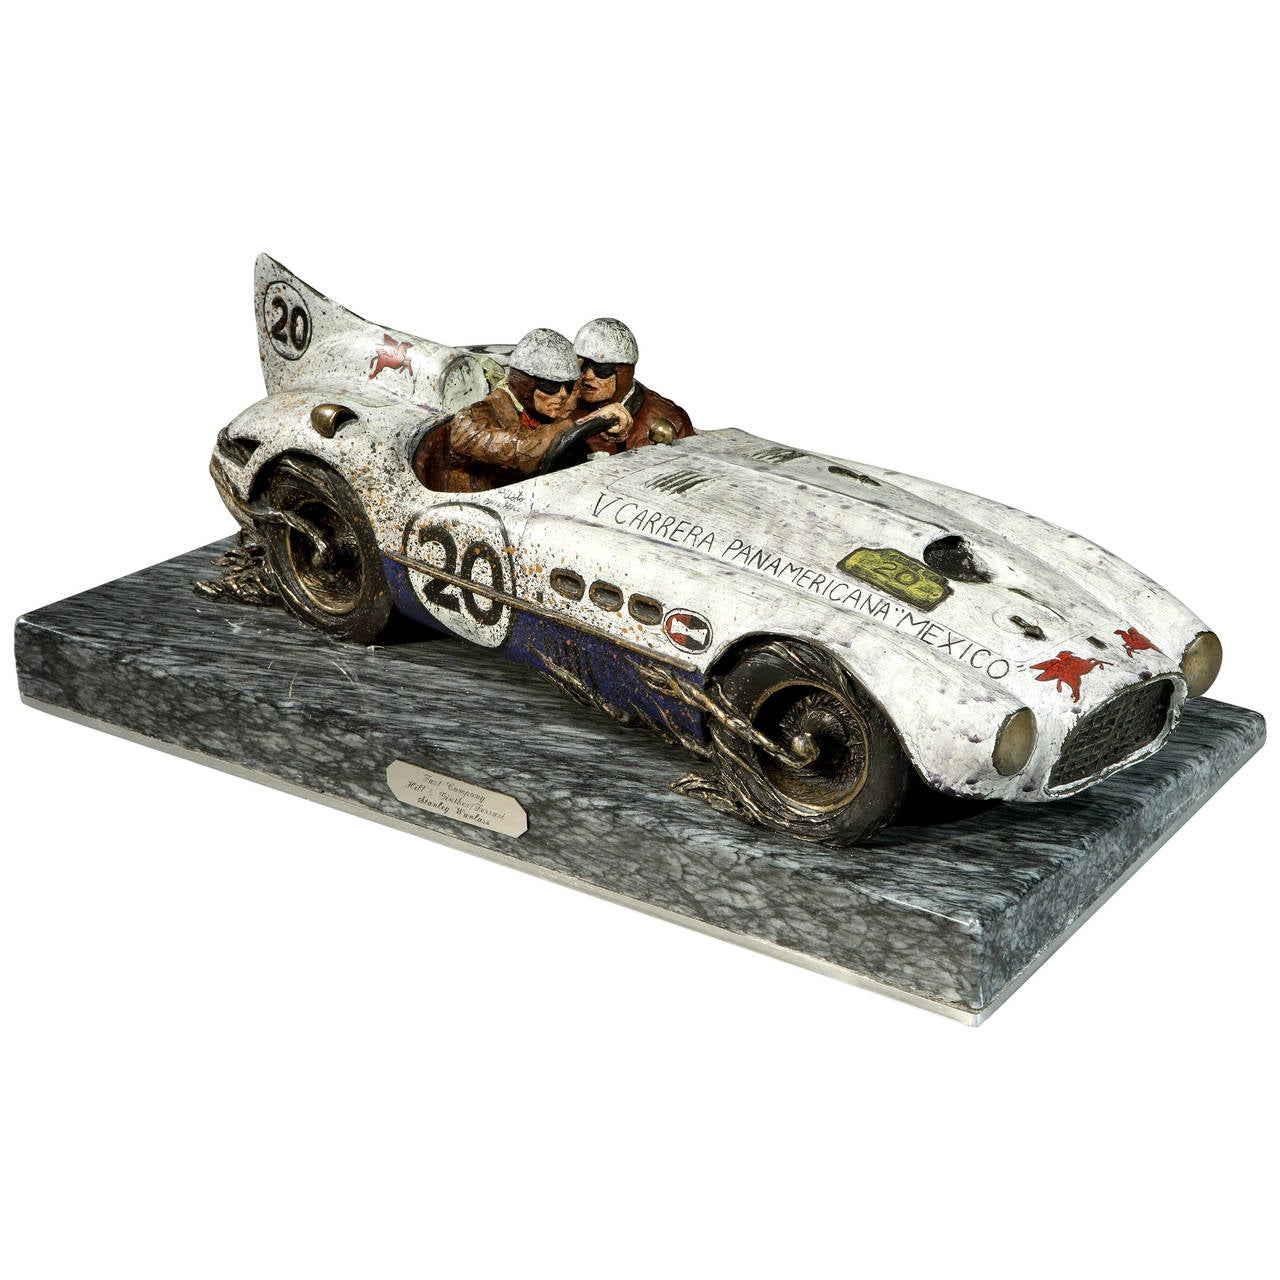 Stanley Wanlass Bronze Ferrari 375 MM 'Carrera Panamericana' Model